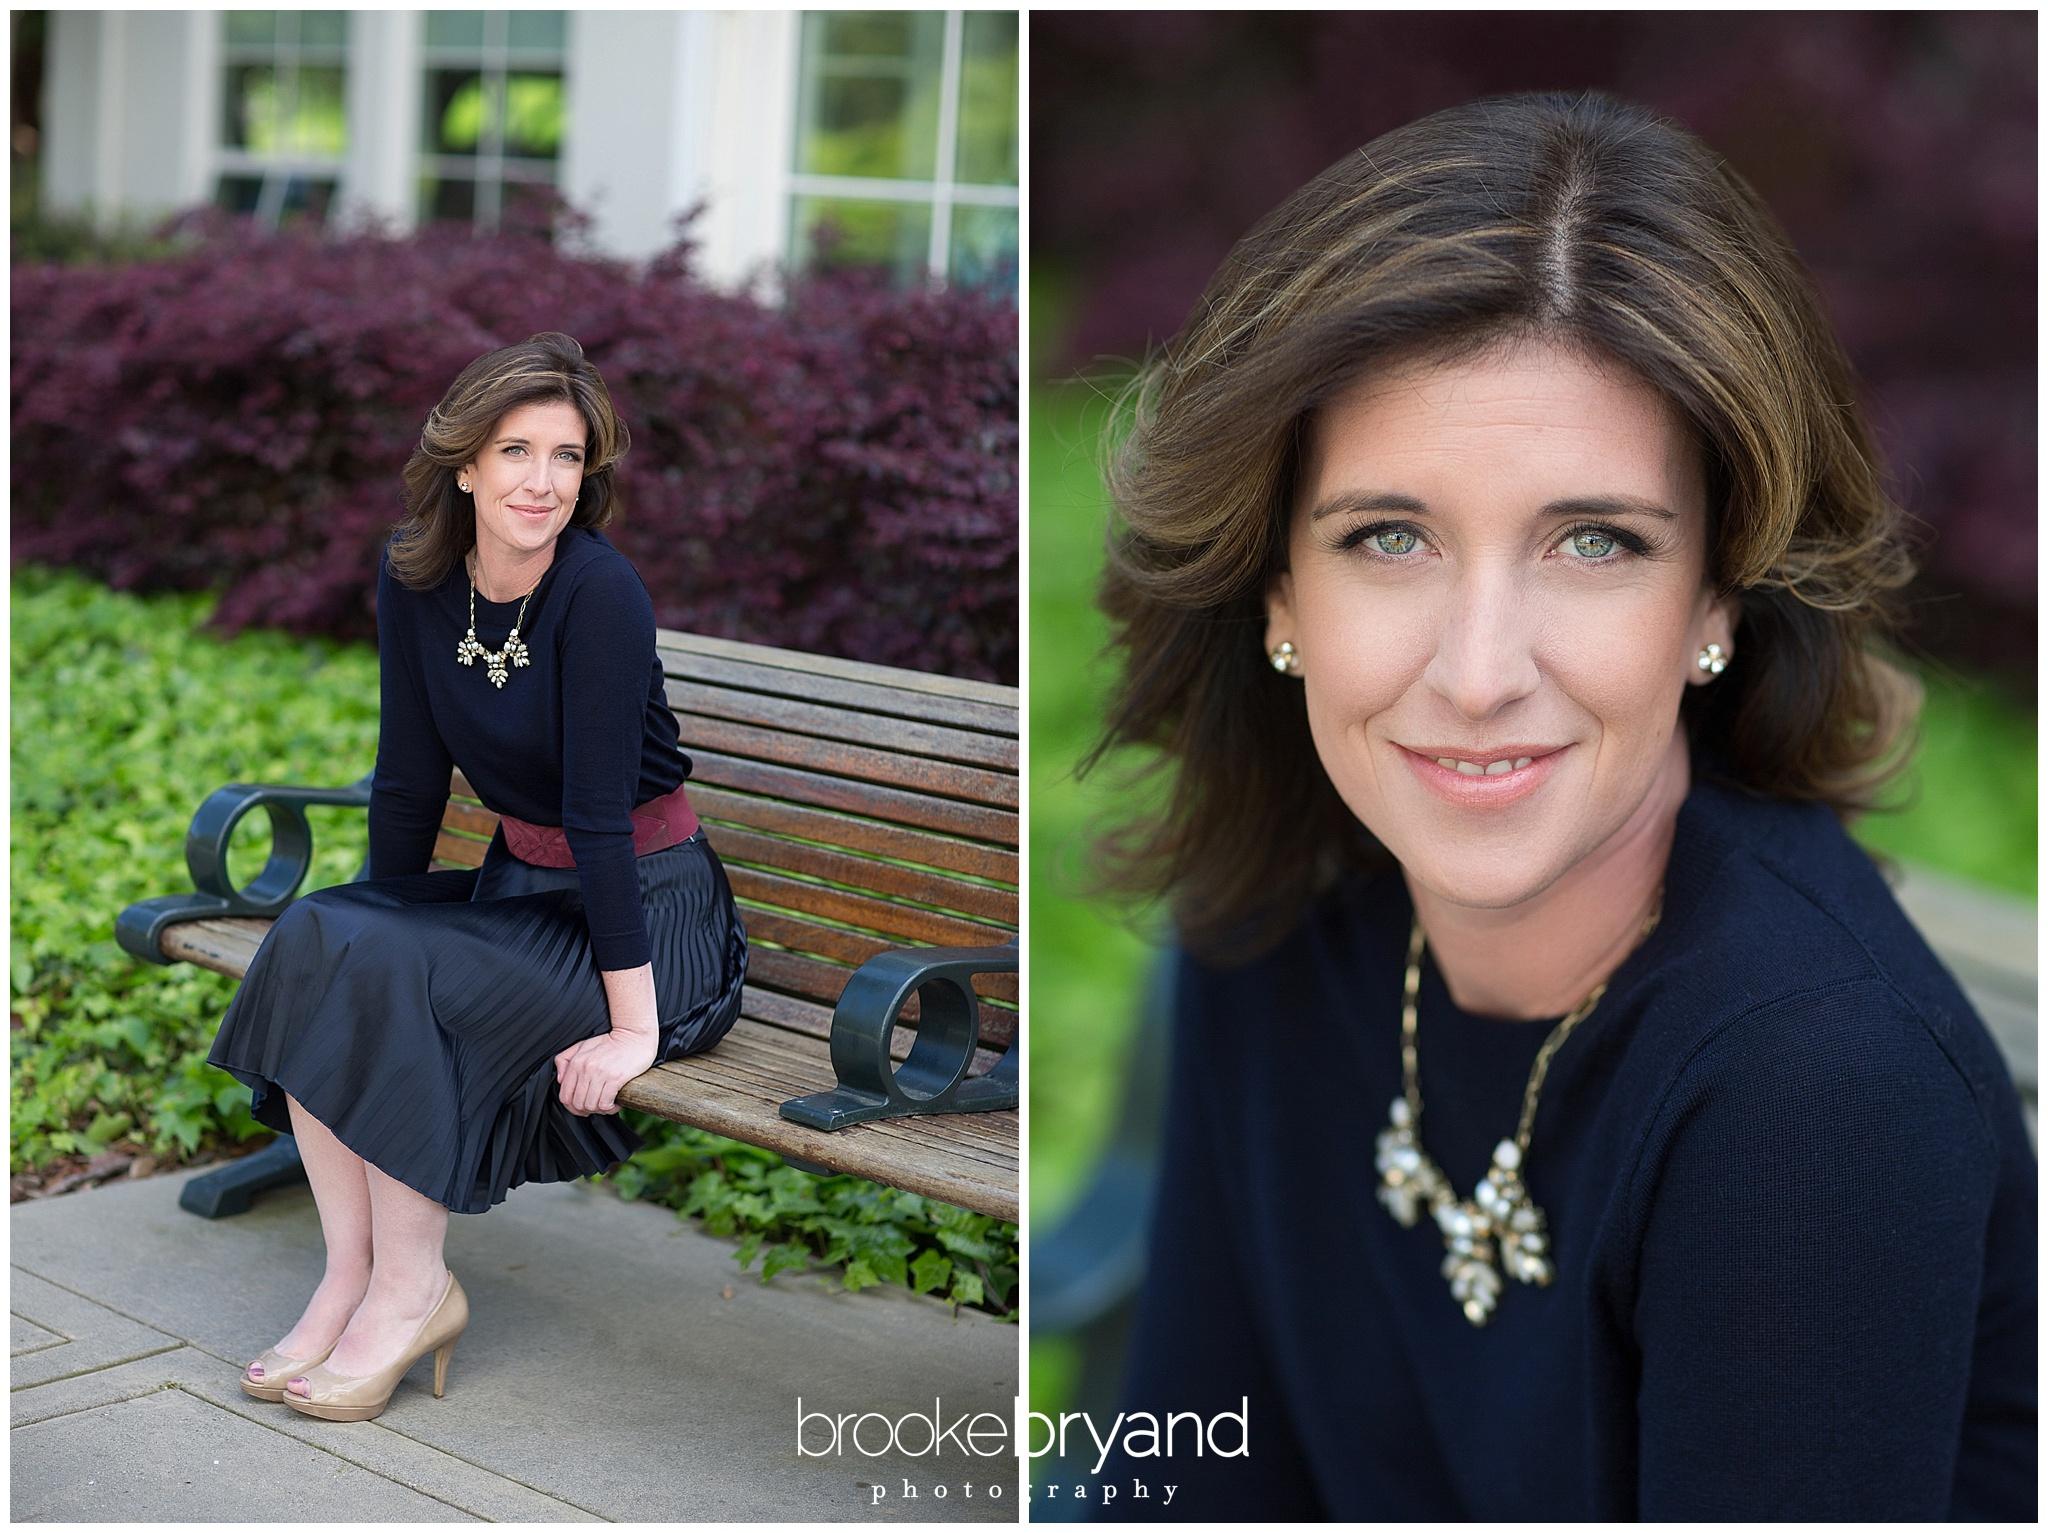 04.2016-Brooke-Bryand-Photography-Raleigh-Headshot-Photographer-BBP_5732_r1.jpg